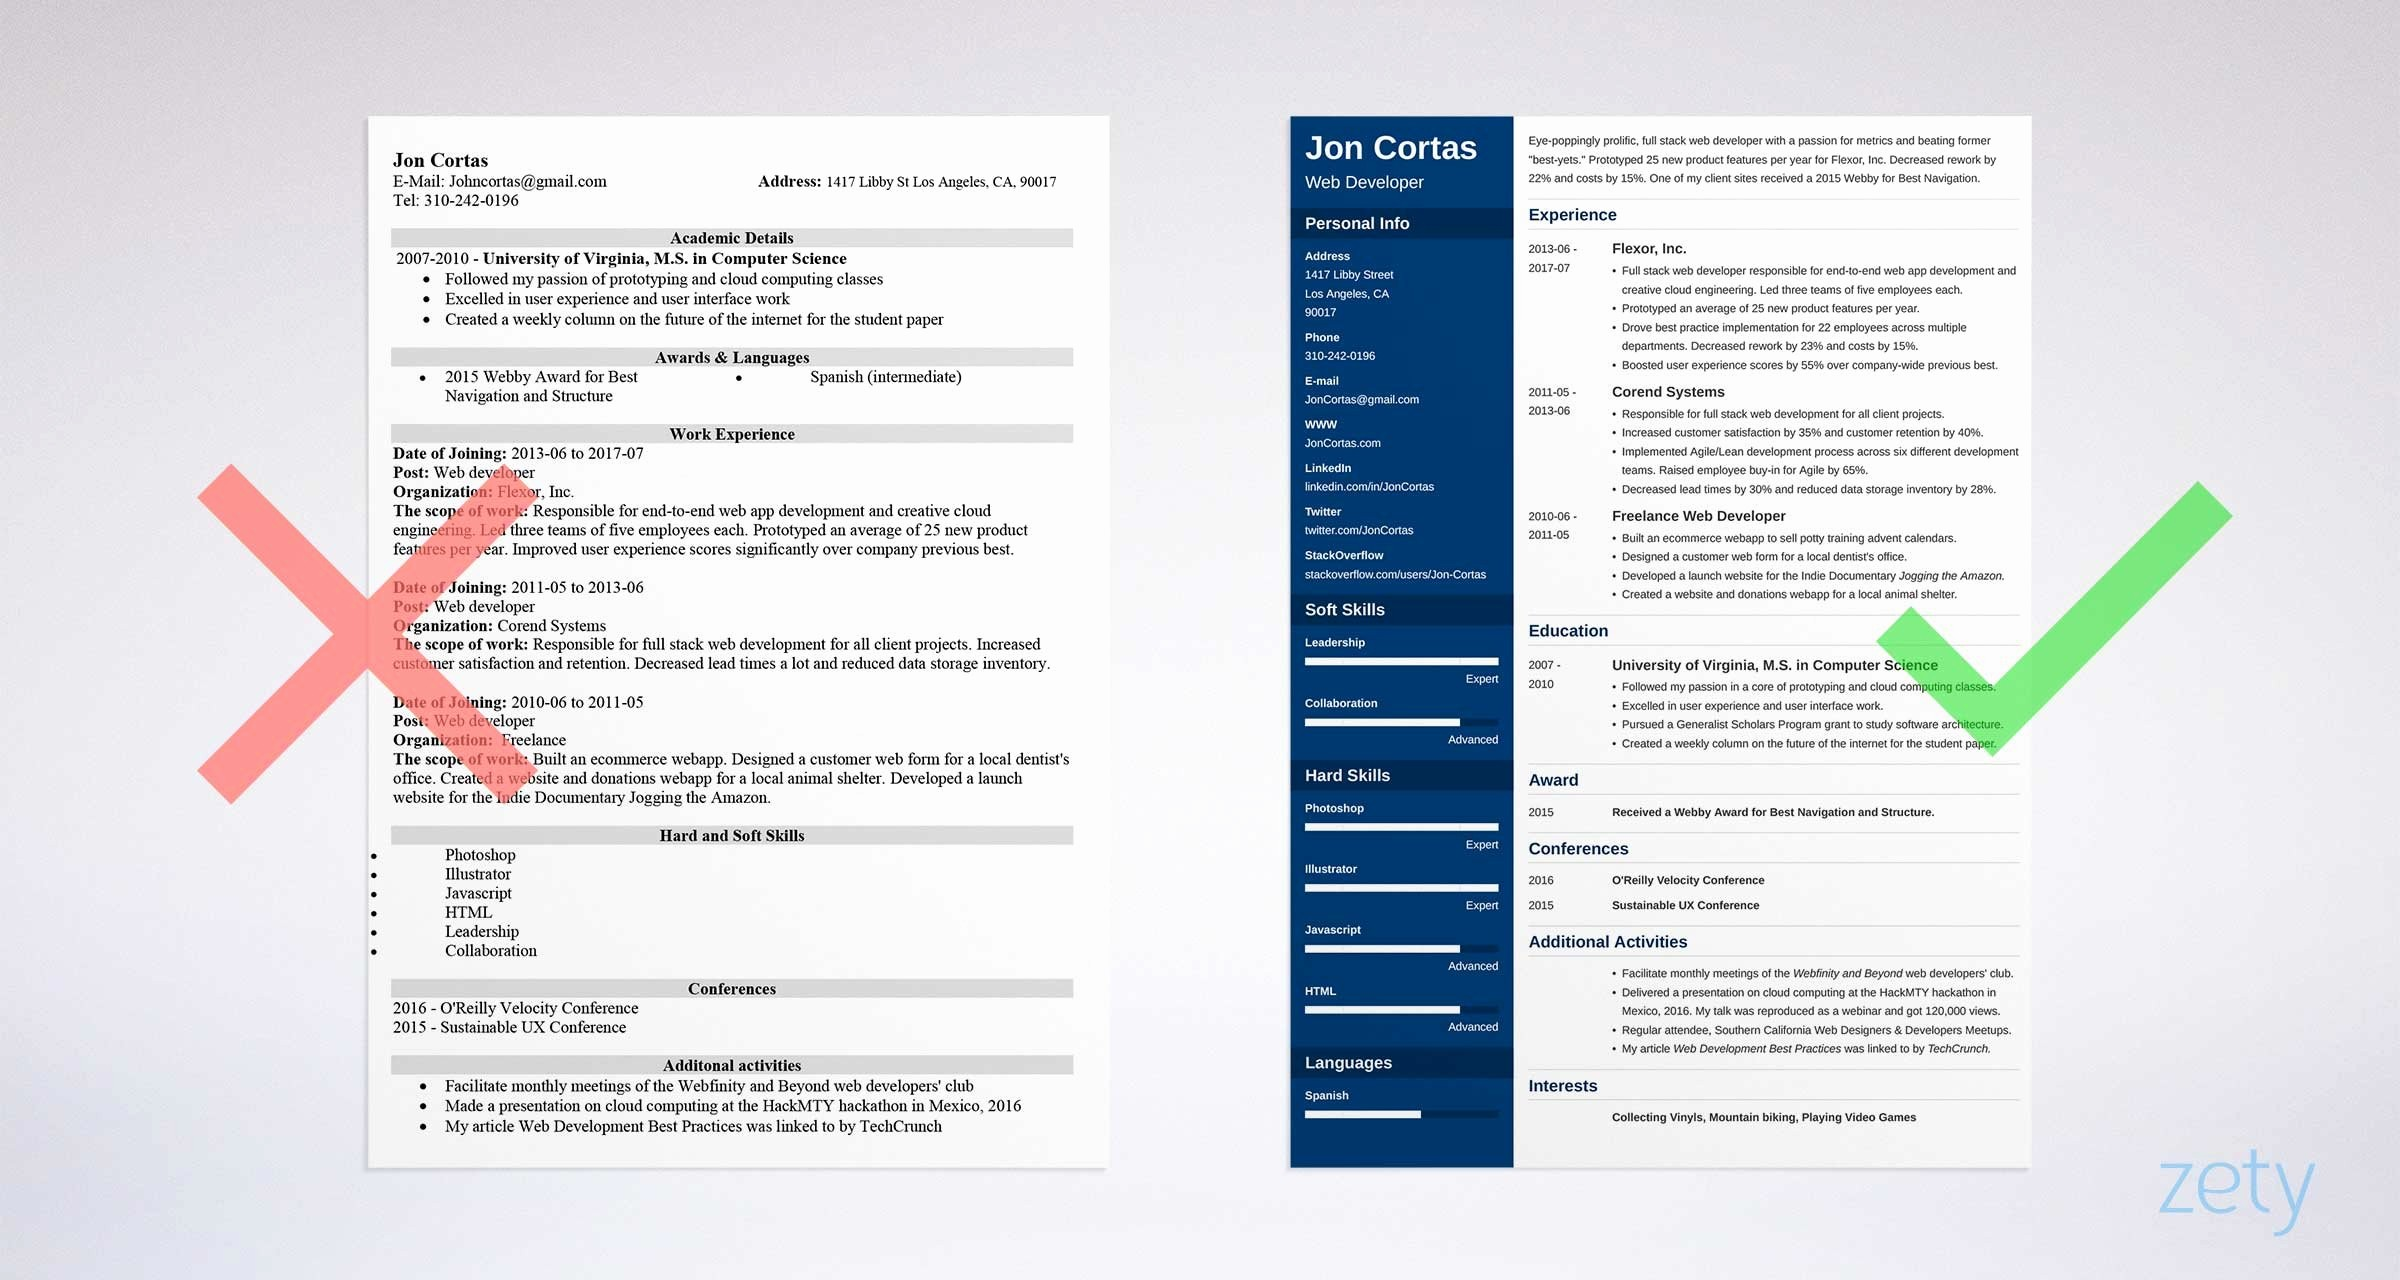 Microsoft Word Template for Resume Elegant Free Resume Templates for Word 15 Cv Resume formats to